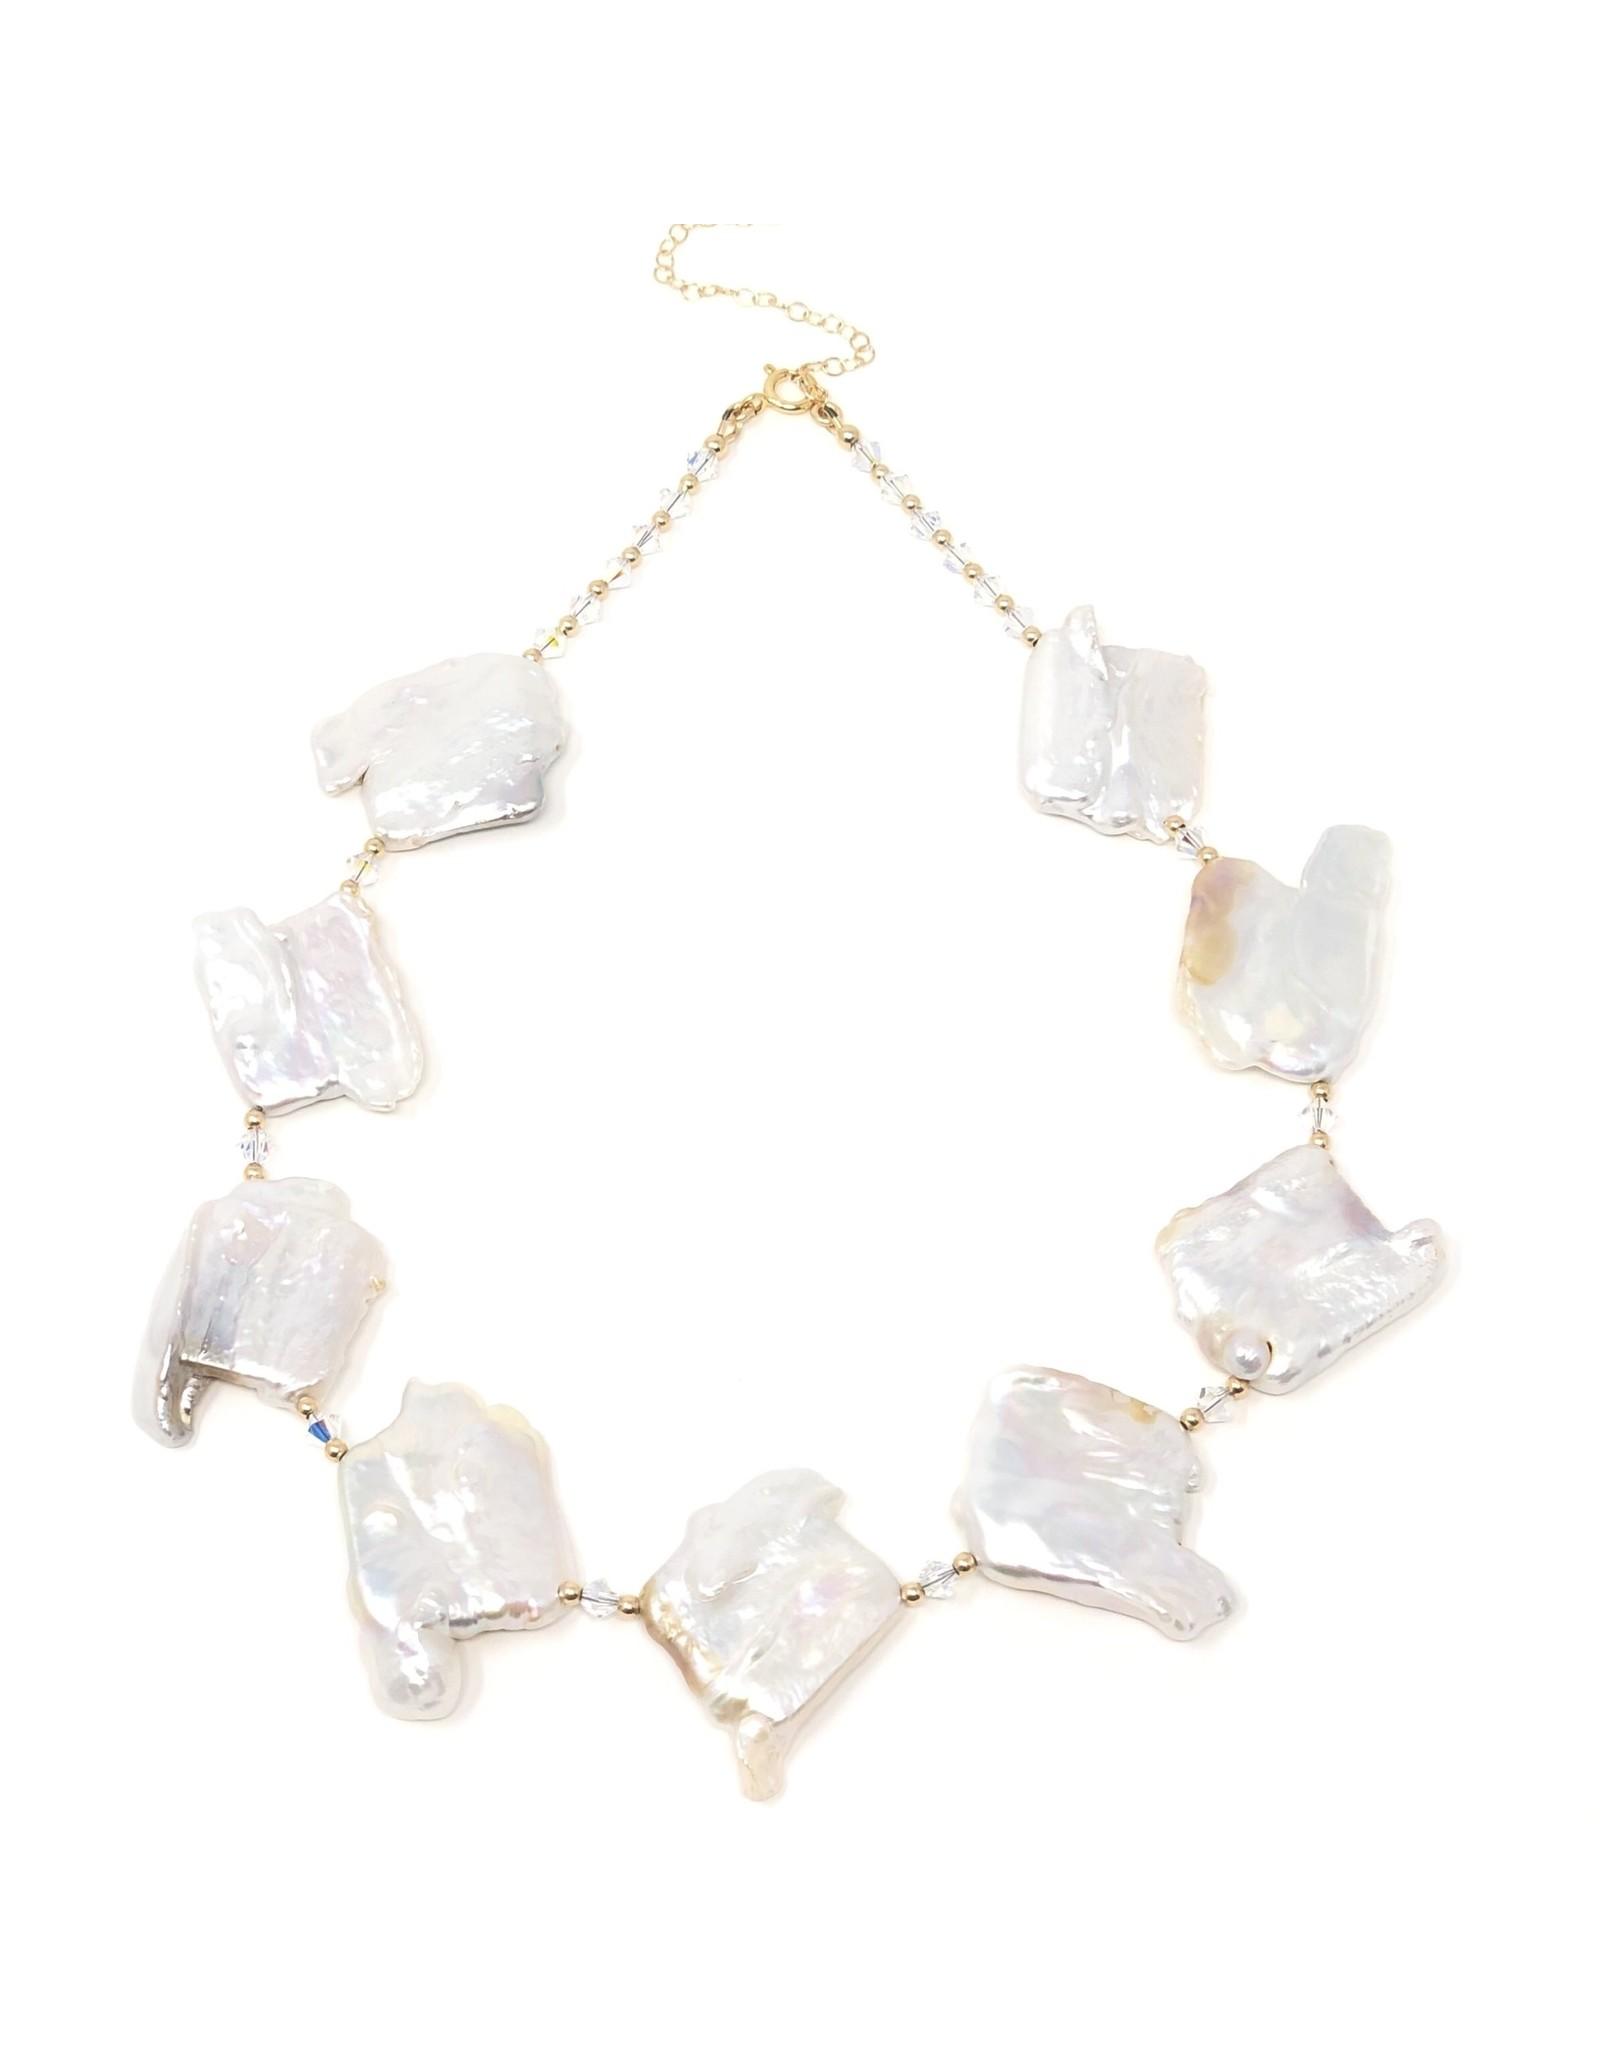 Keshi Pearl & Swarovski Crystal Necklace